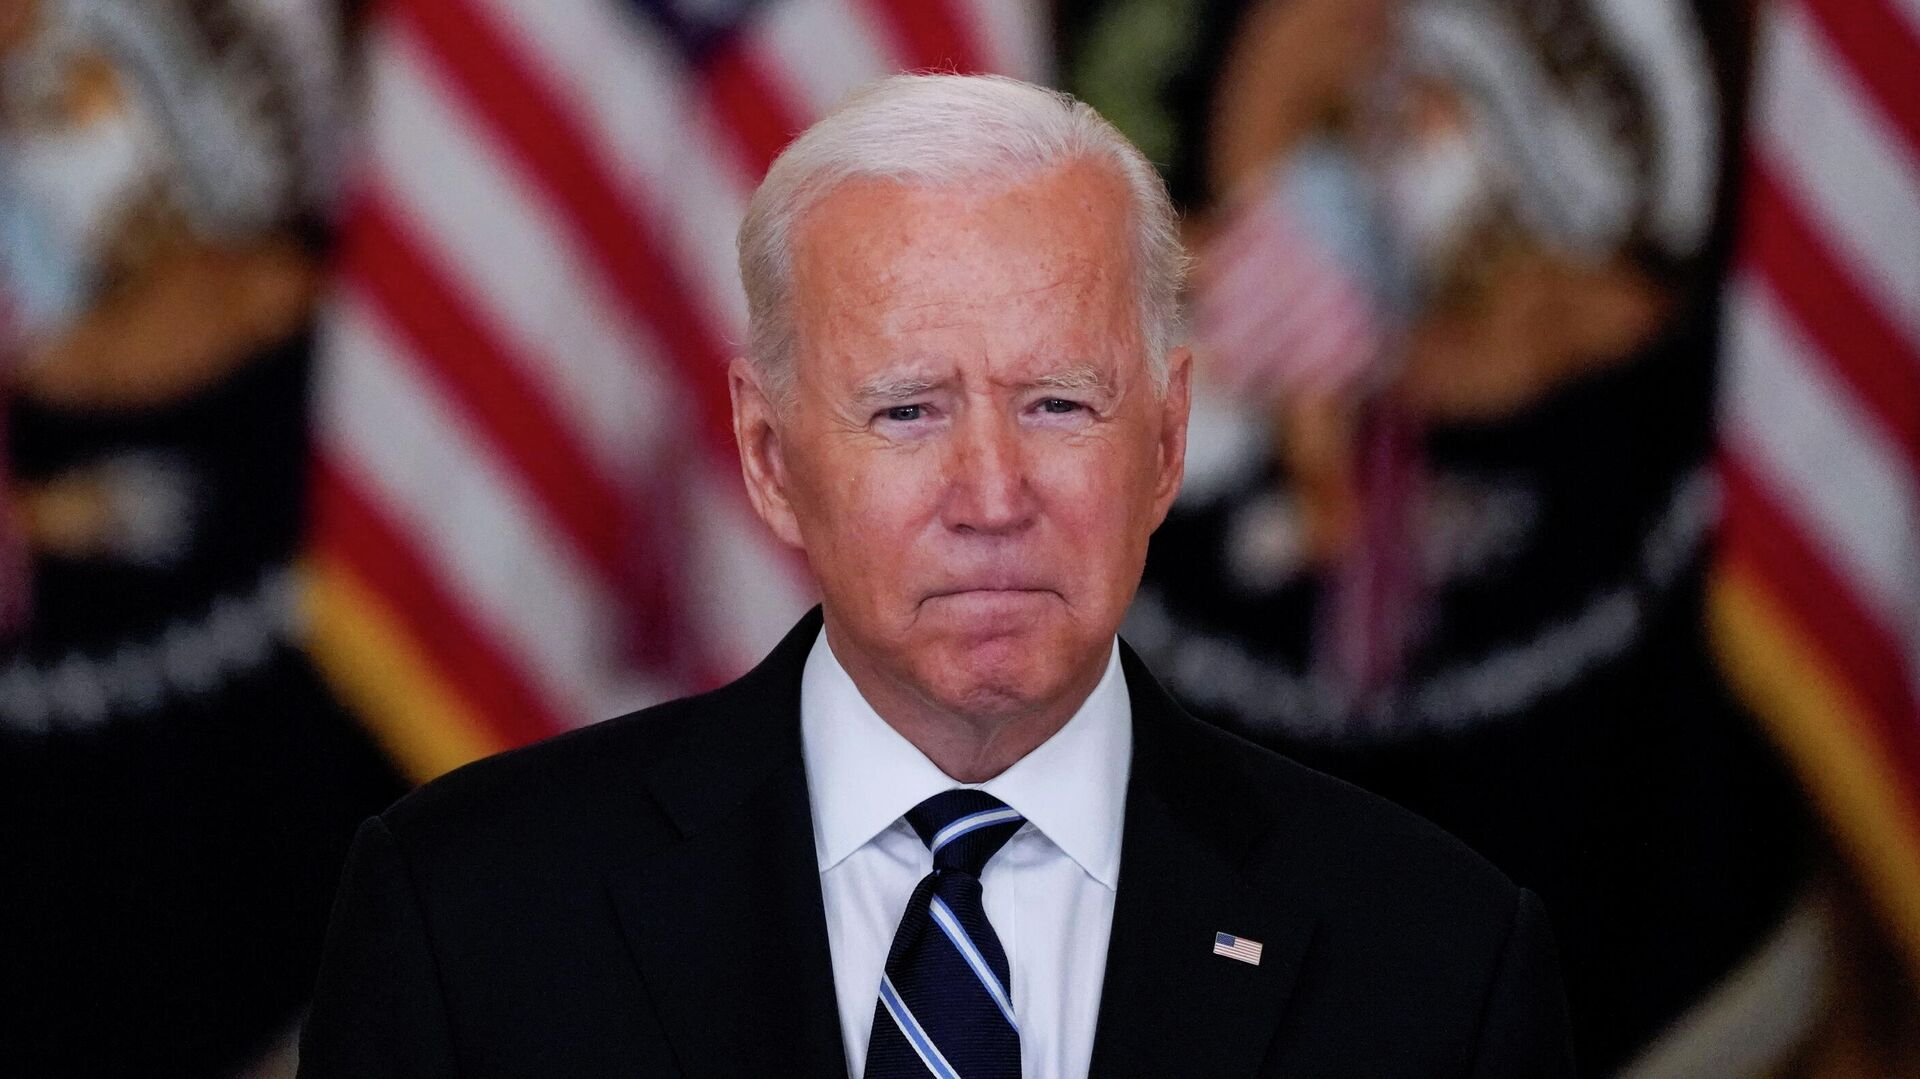 Joe Biden, presidente de EEUU   - Sputnik Mundo, 1920, 15.09.2021